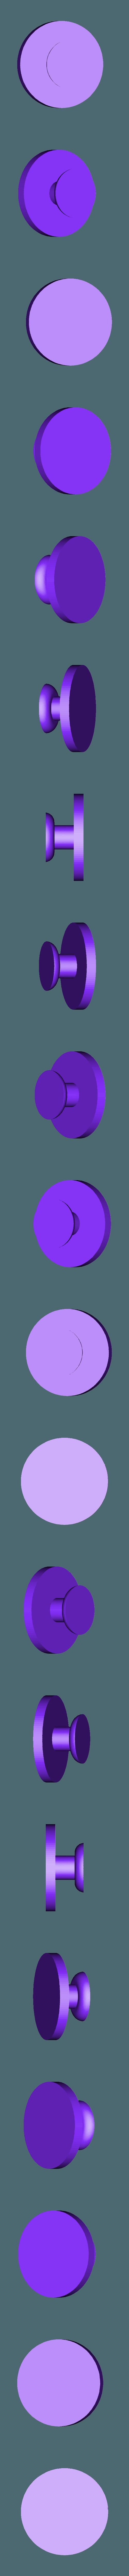 Phone_Clip_Button.stl Download free STL file Phone Clip • 3D print template, stugpanzer